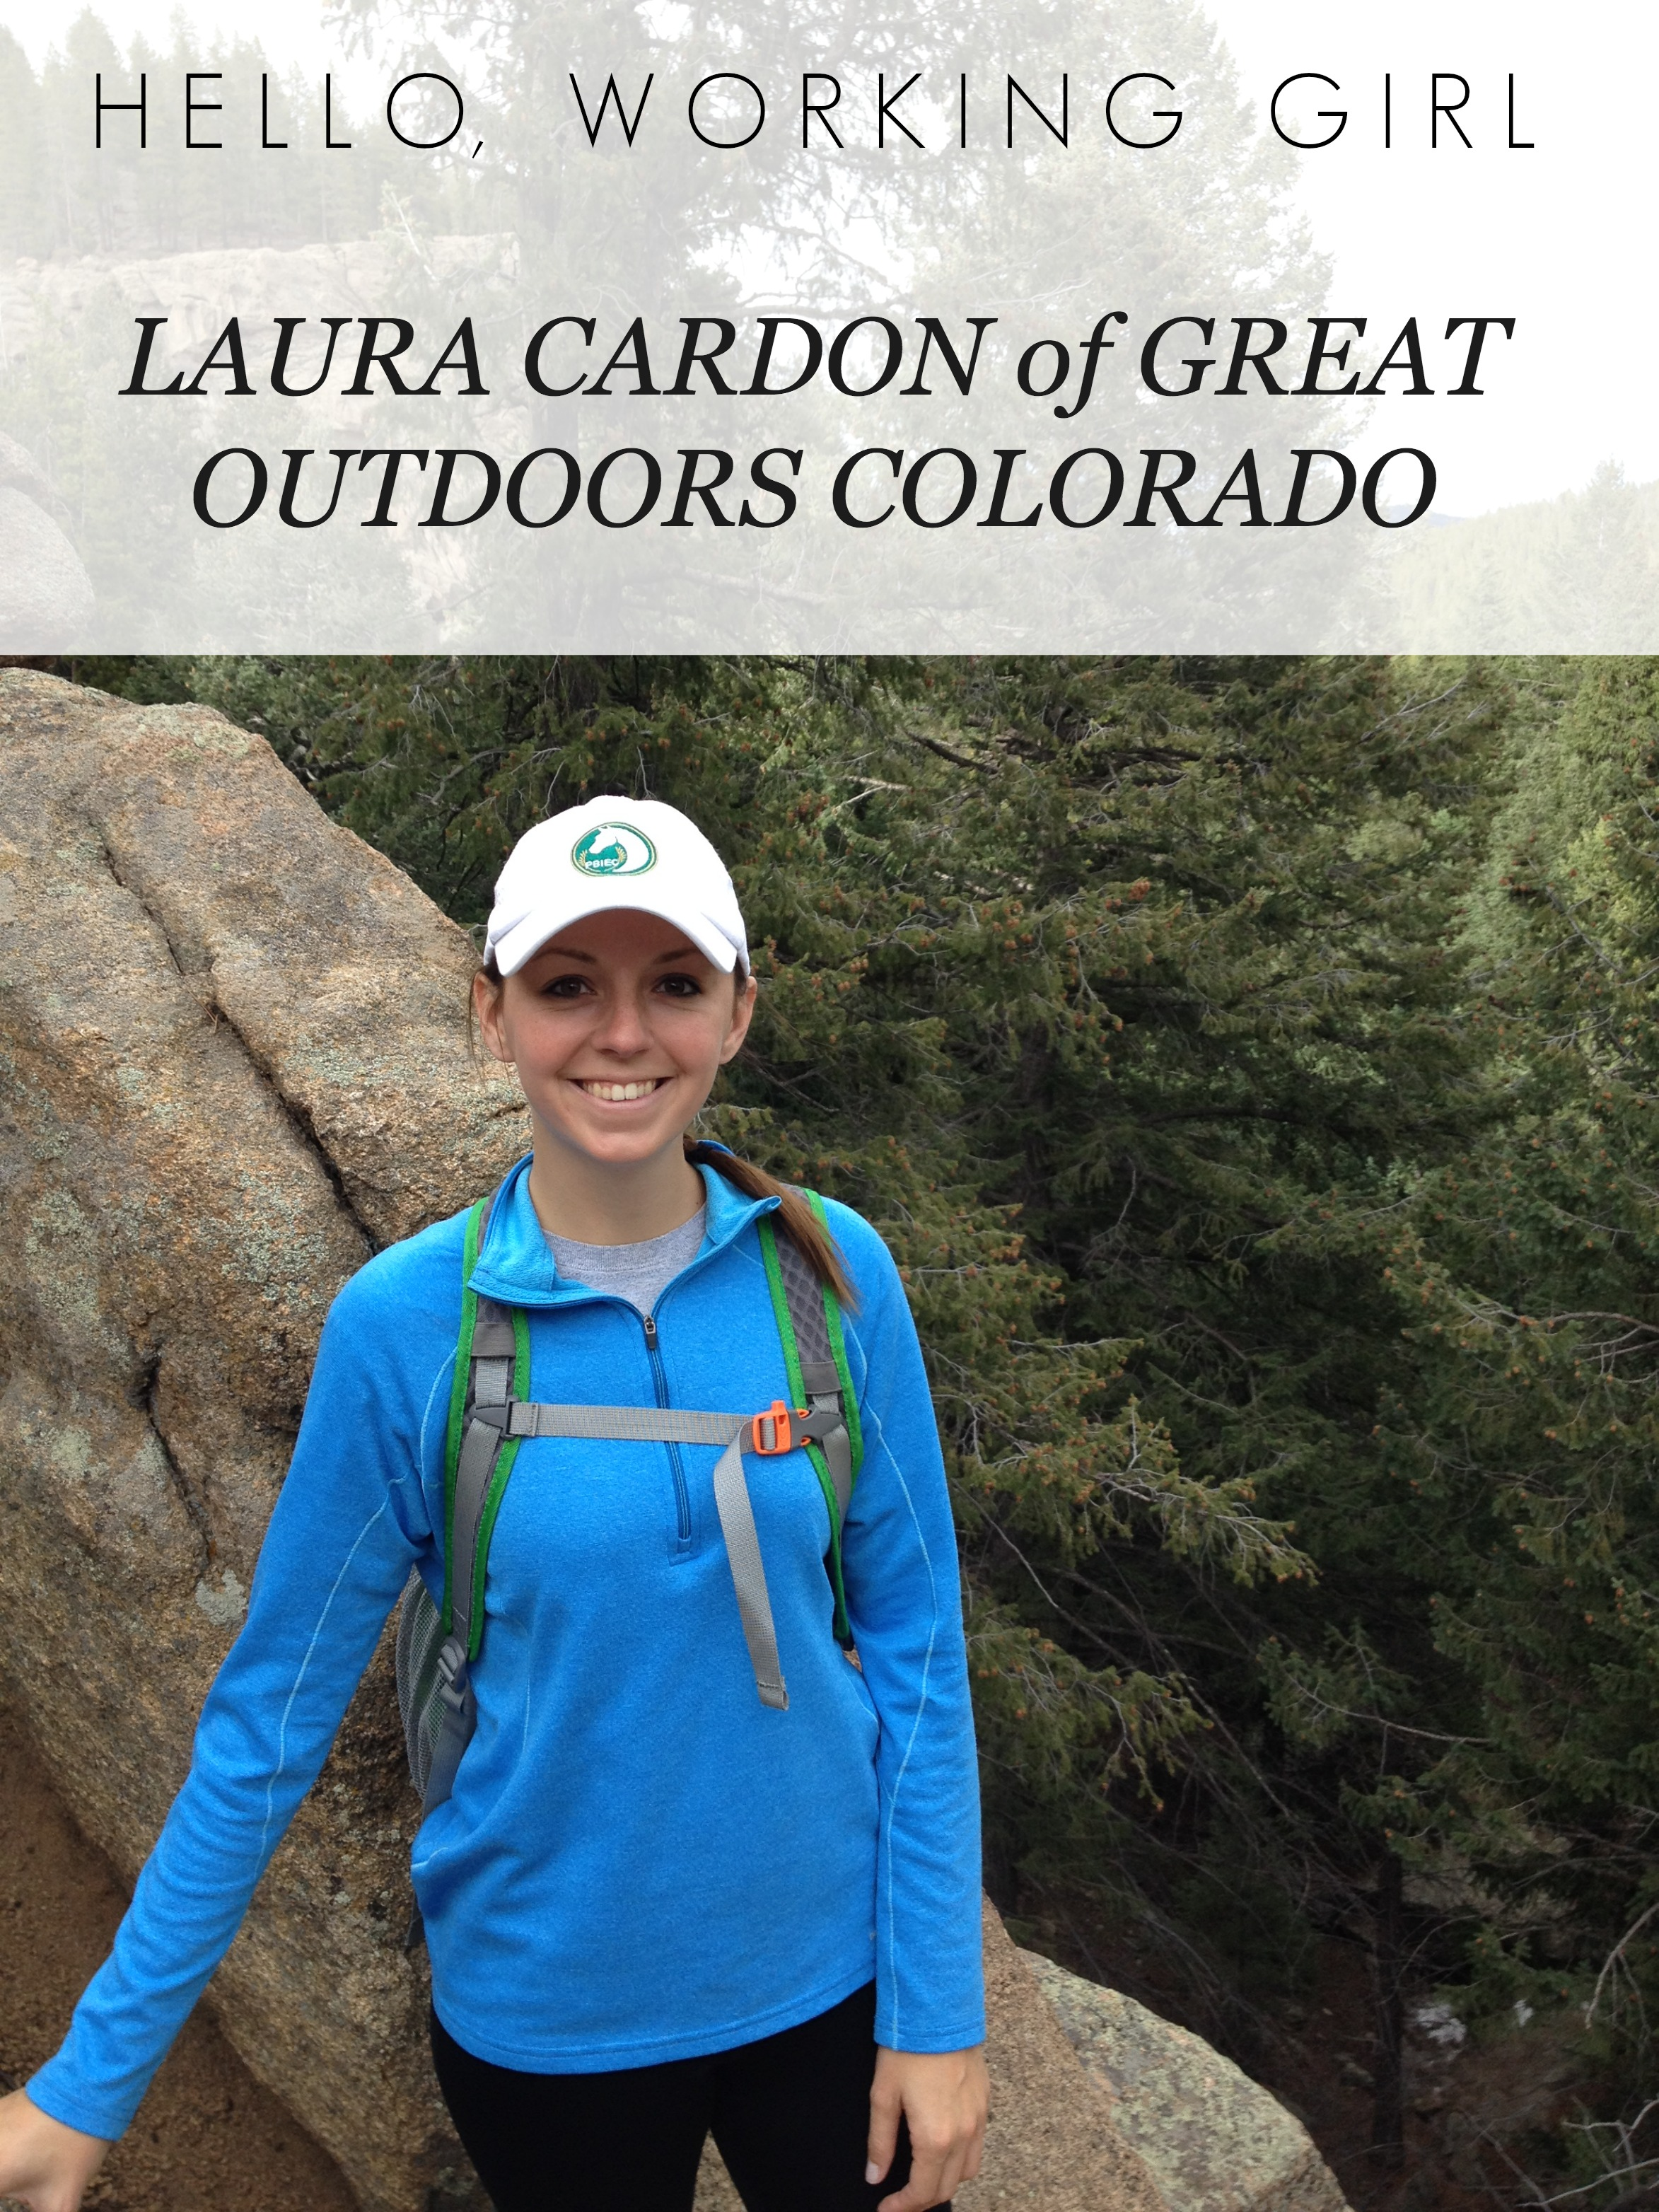 Laura Cardon